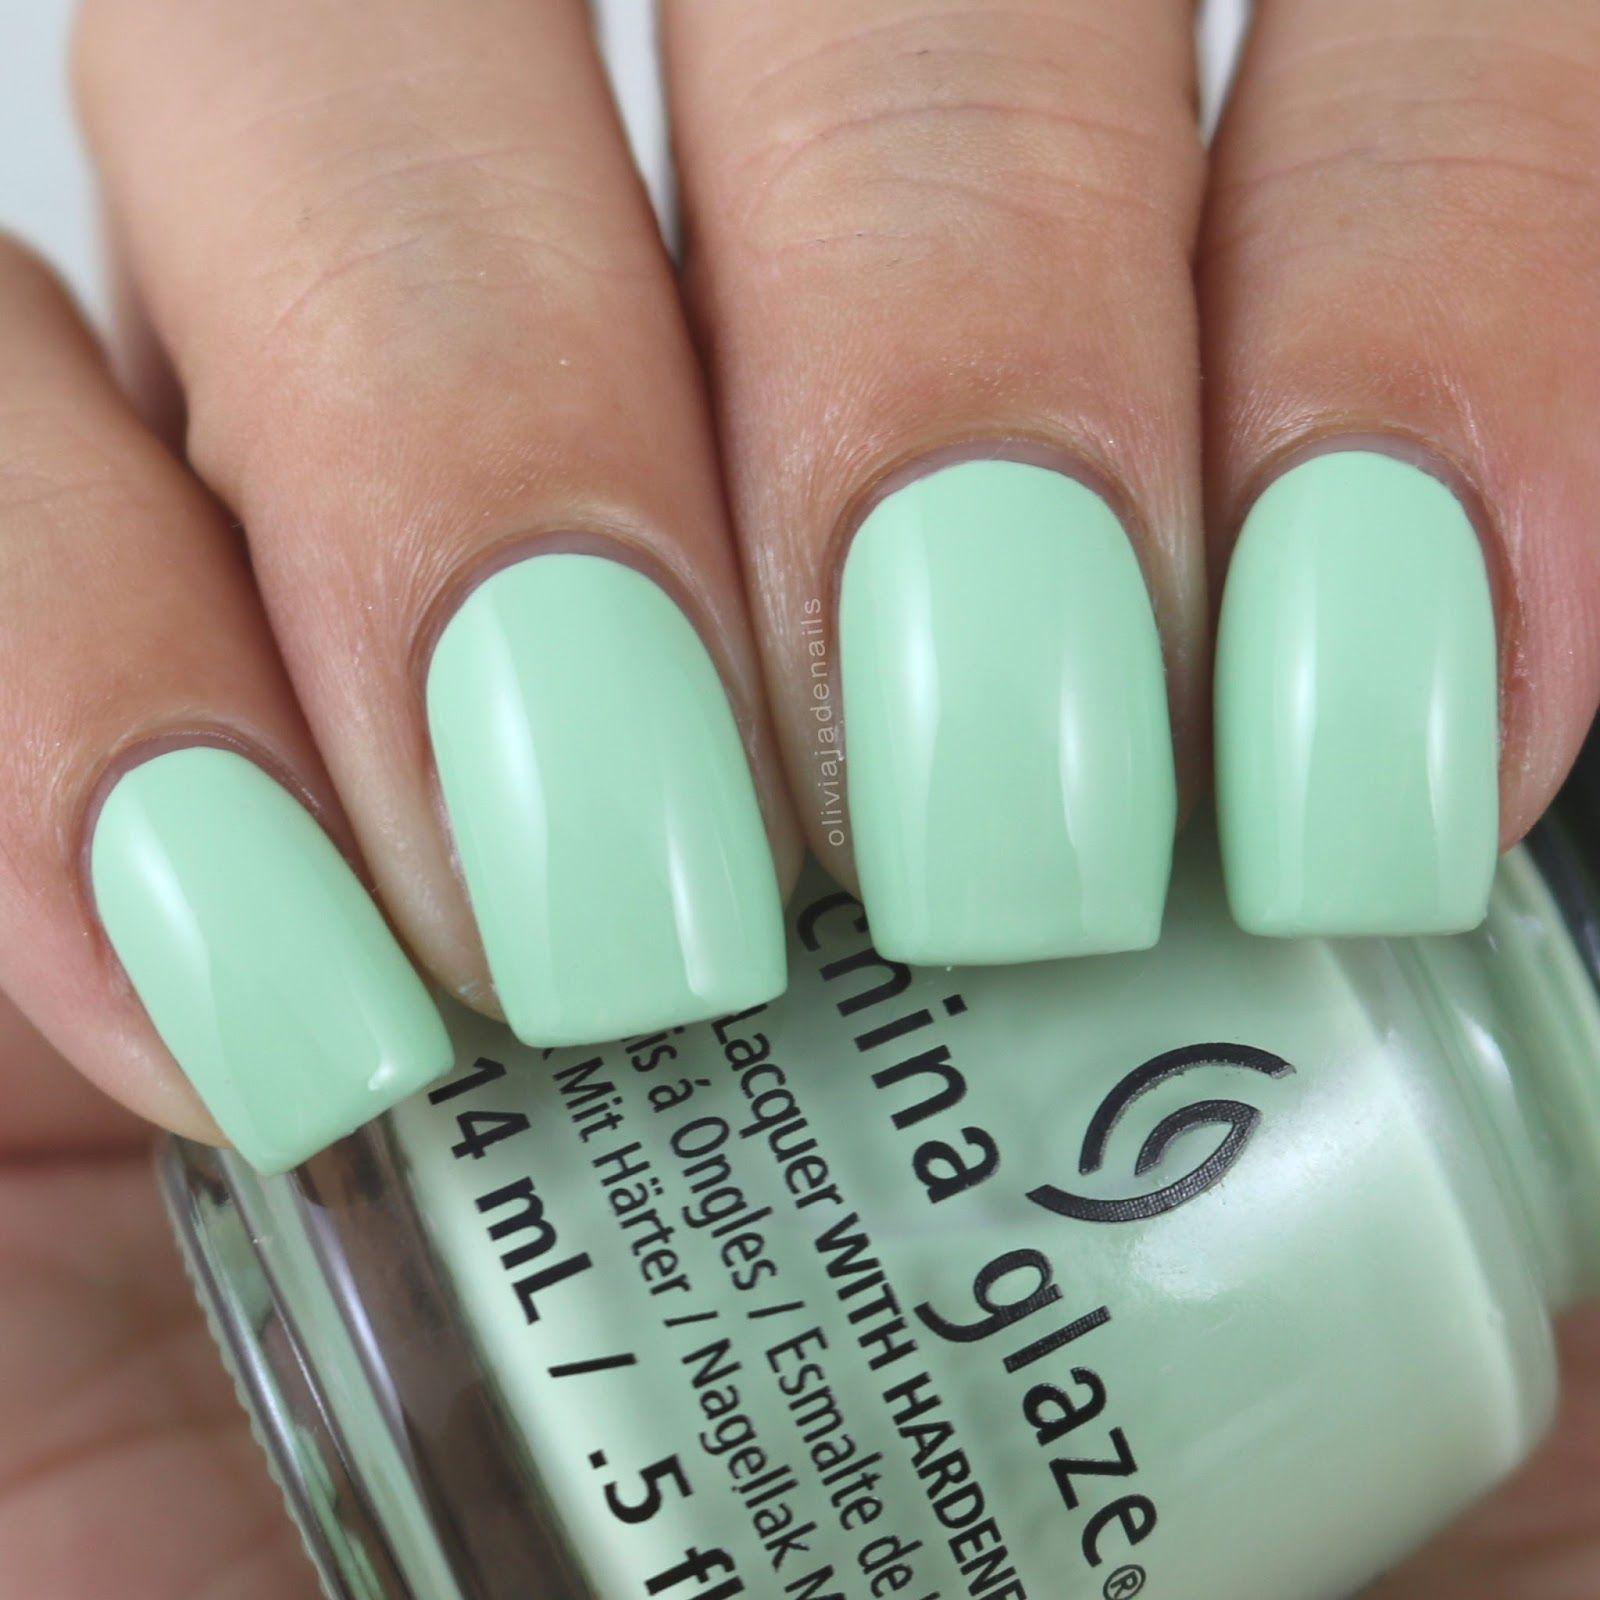 China Glaze Spring Jungle swatched by Olivia Jade Nails | Nails ...